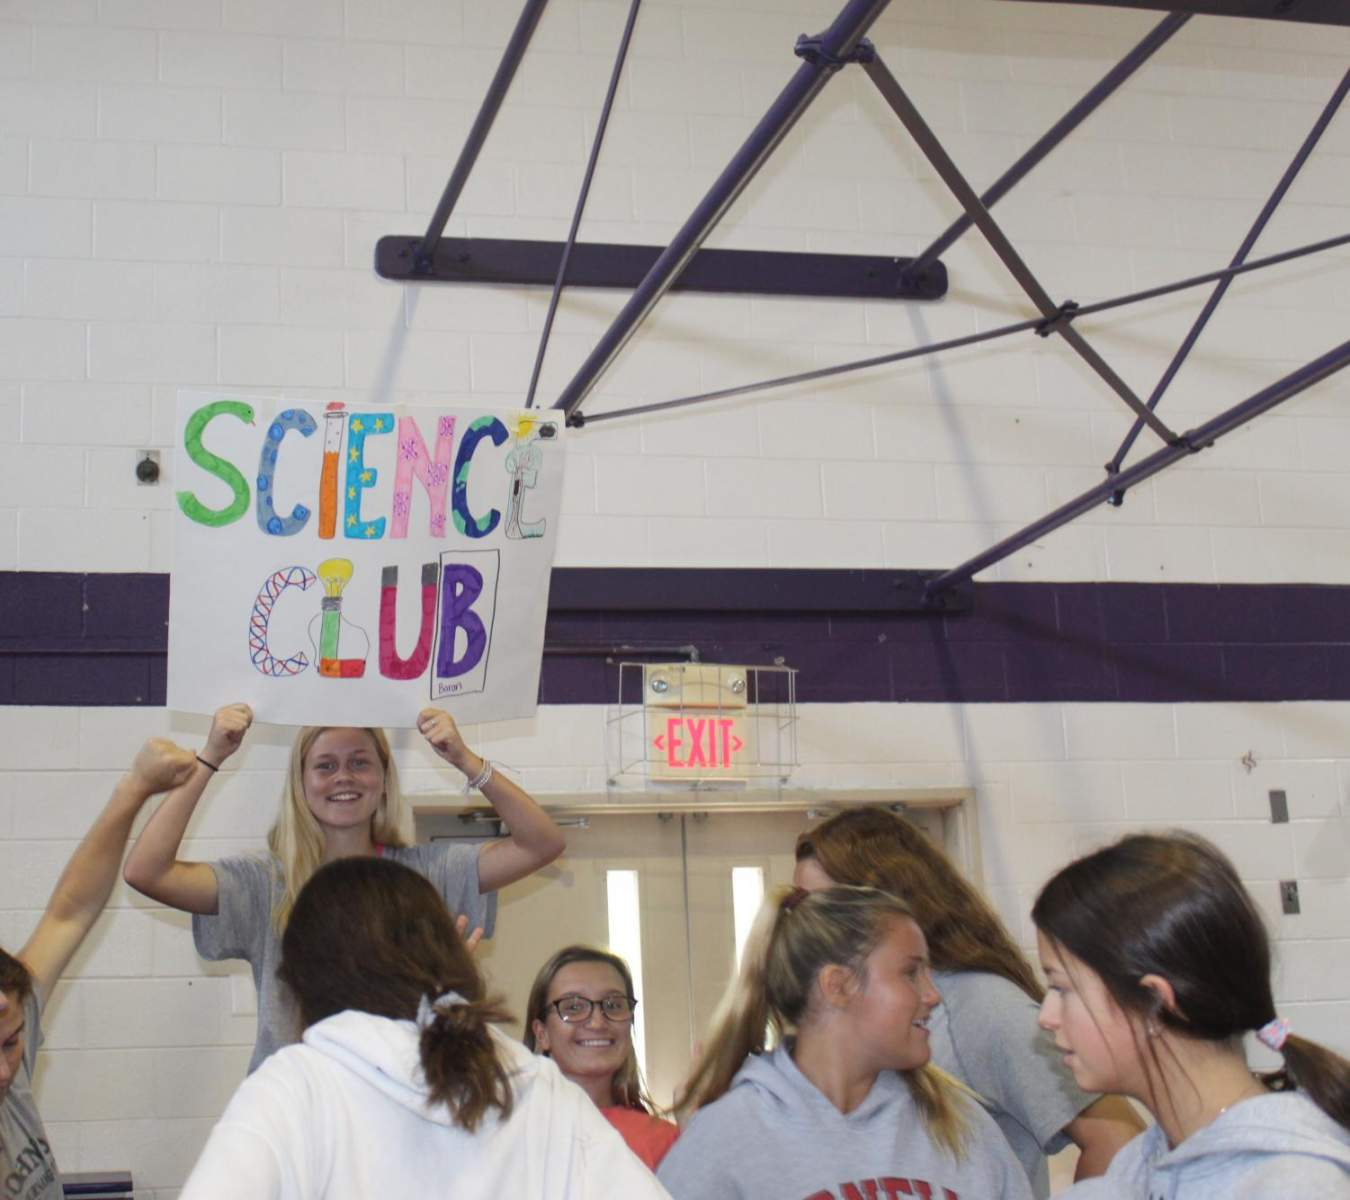 Enthusiasm for Science Club